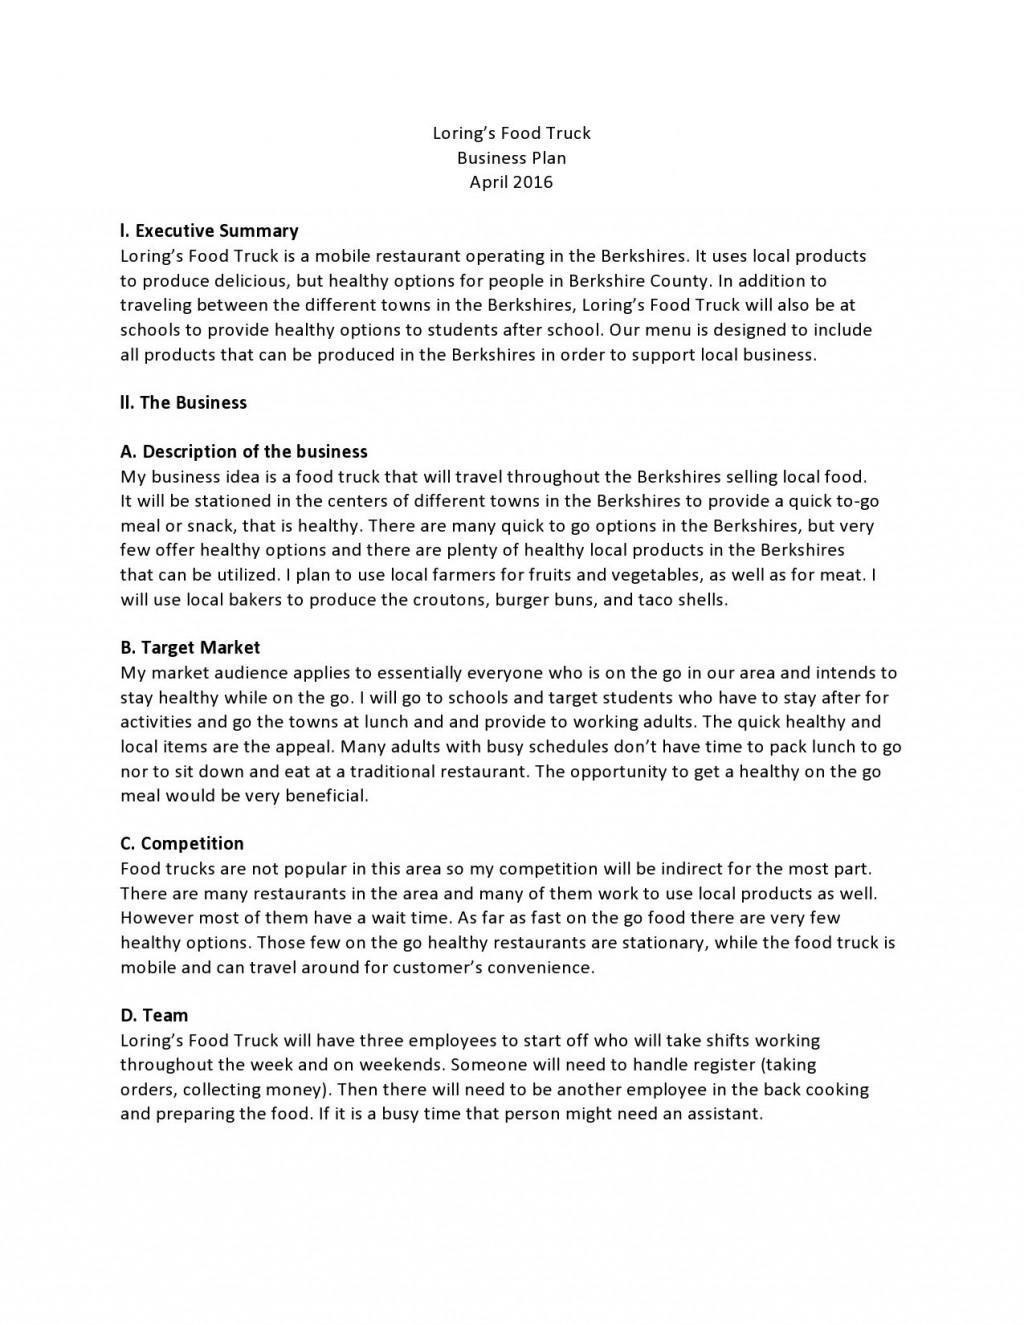 006 Unforgettable Restaurant Busines Plan Sample Uk Concept  Template FreeLarge